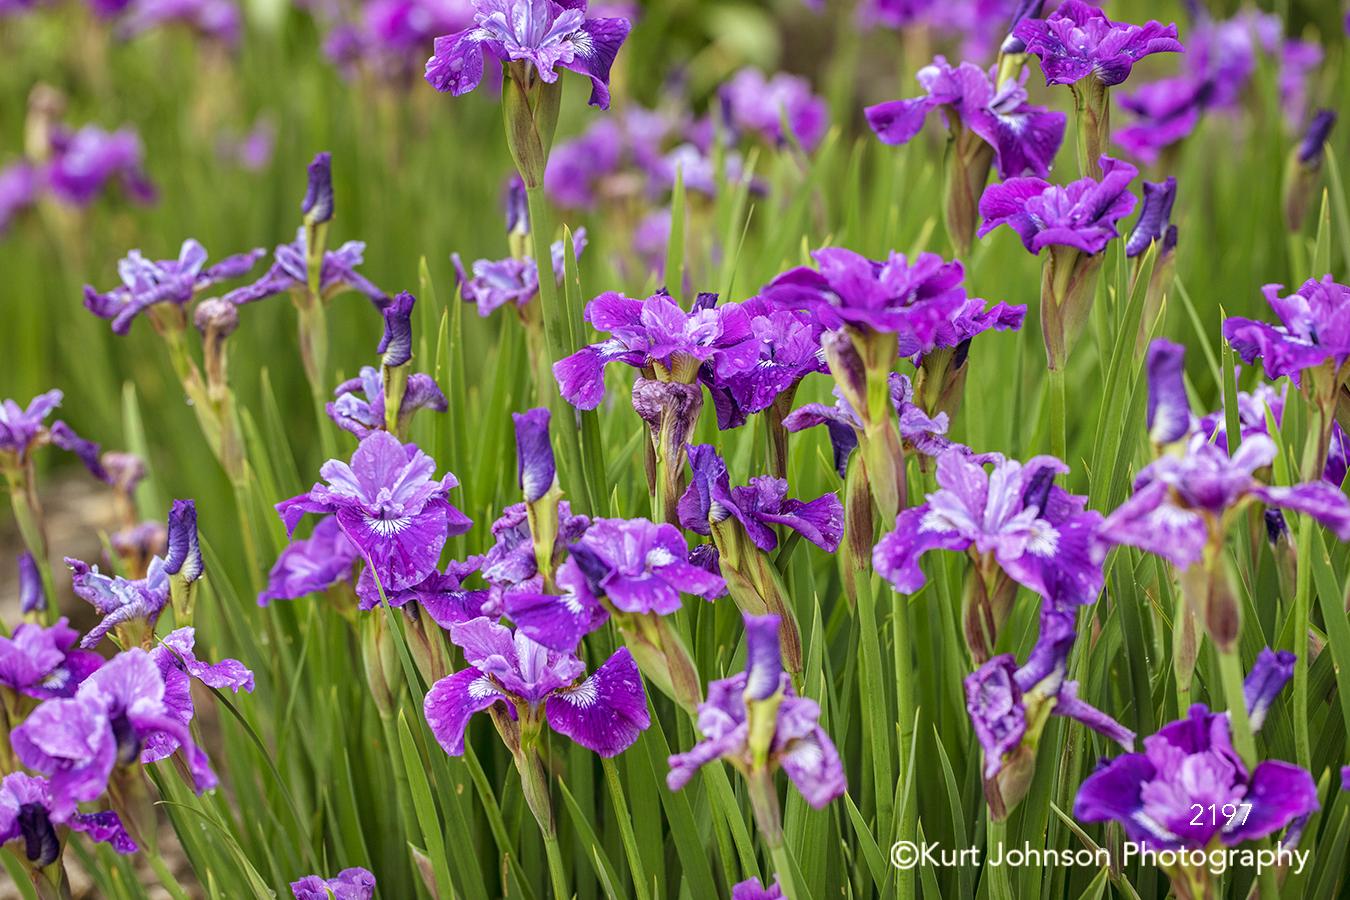 purple green grass flower flowers field lavender violet iris wildflowers